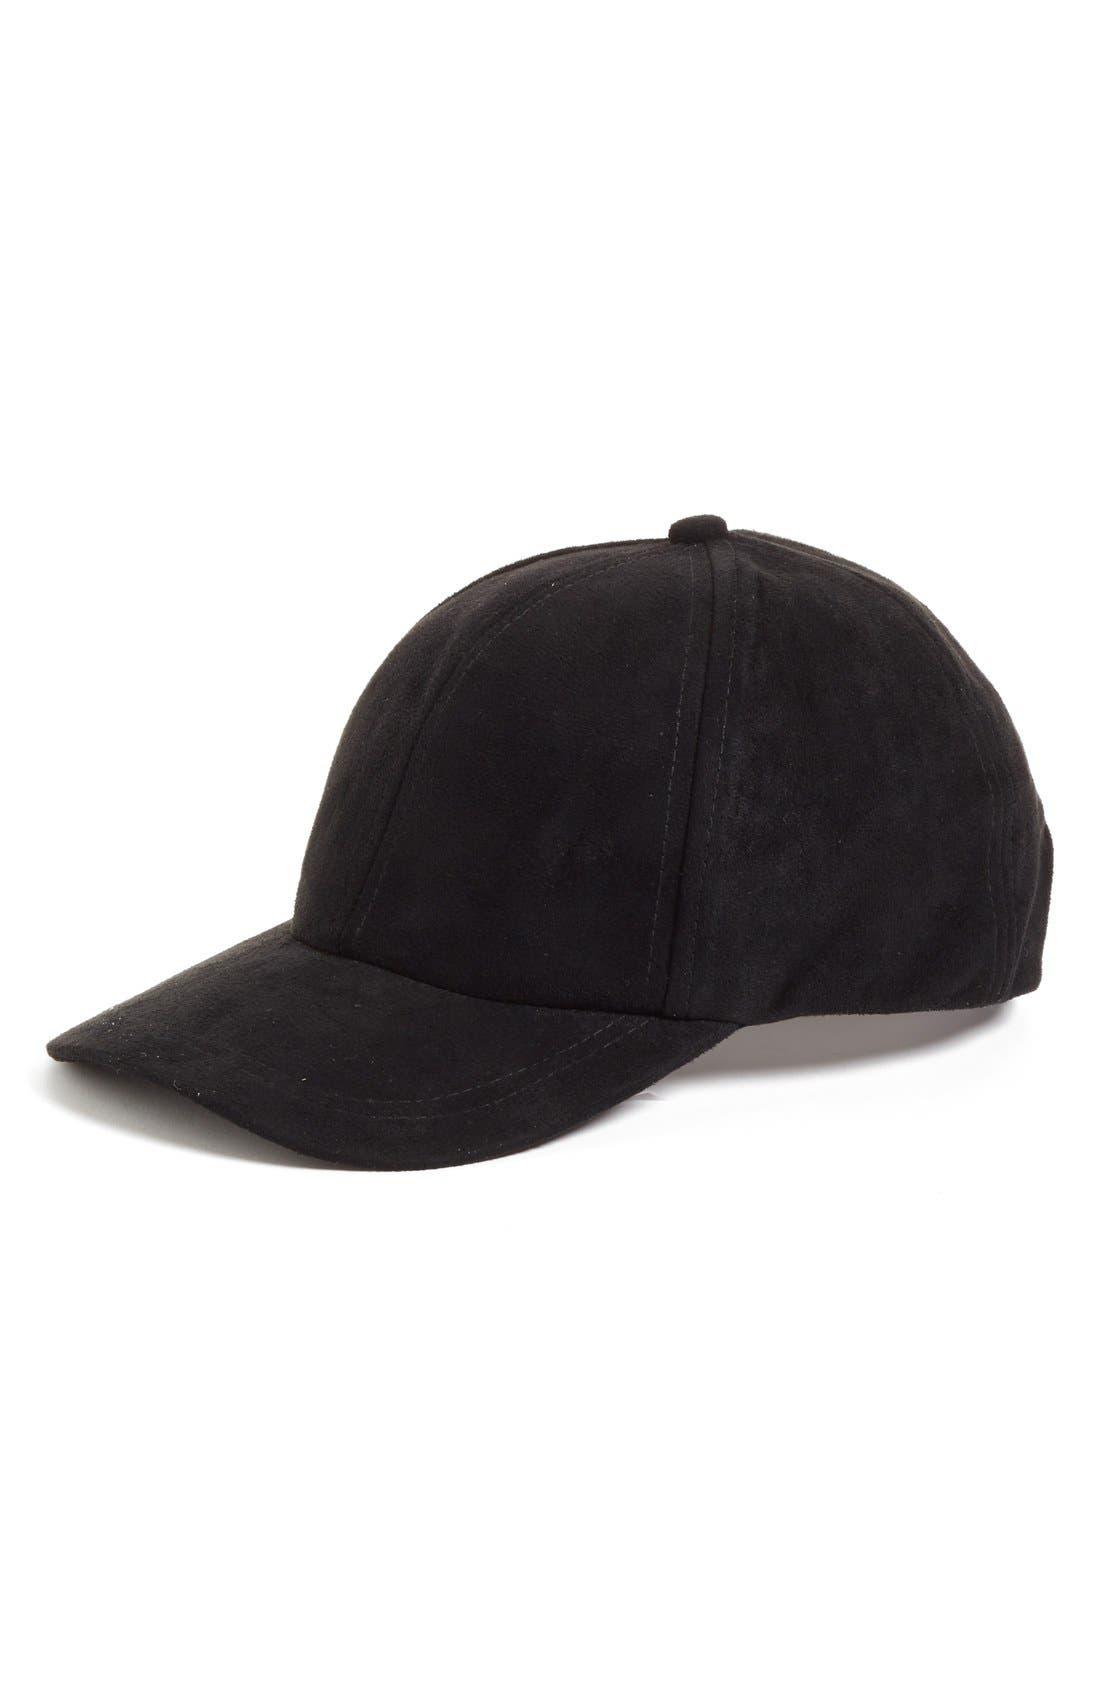 Alternate Image 1 Selected - Collection XIIX Baseball Cap